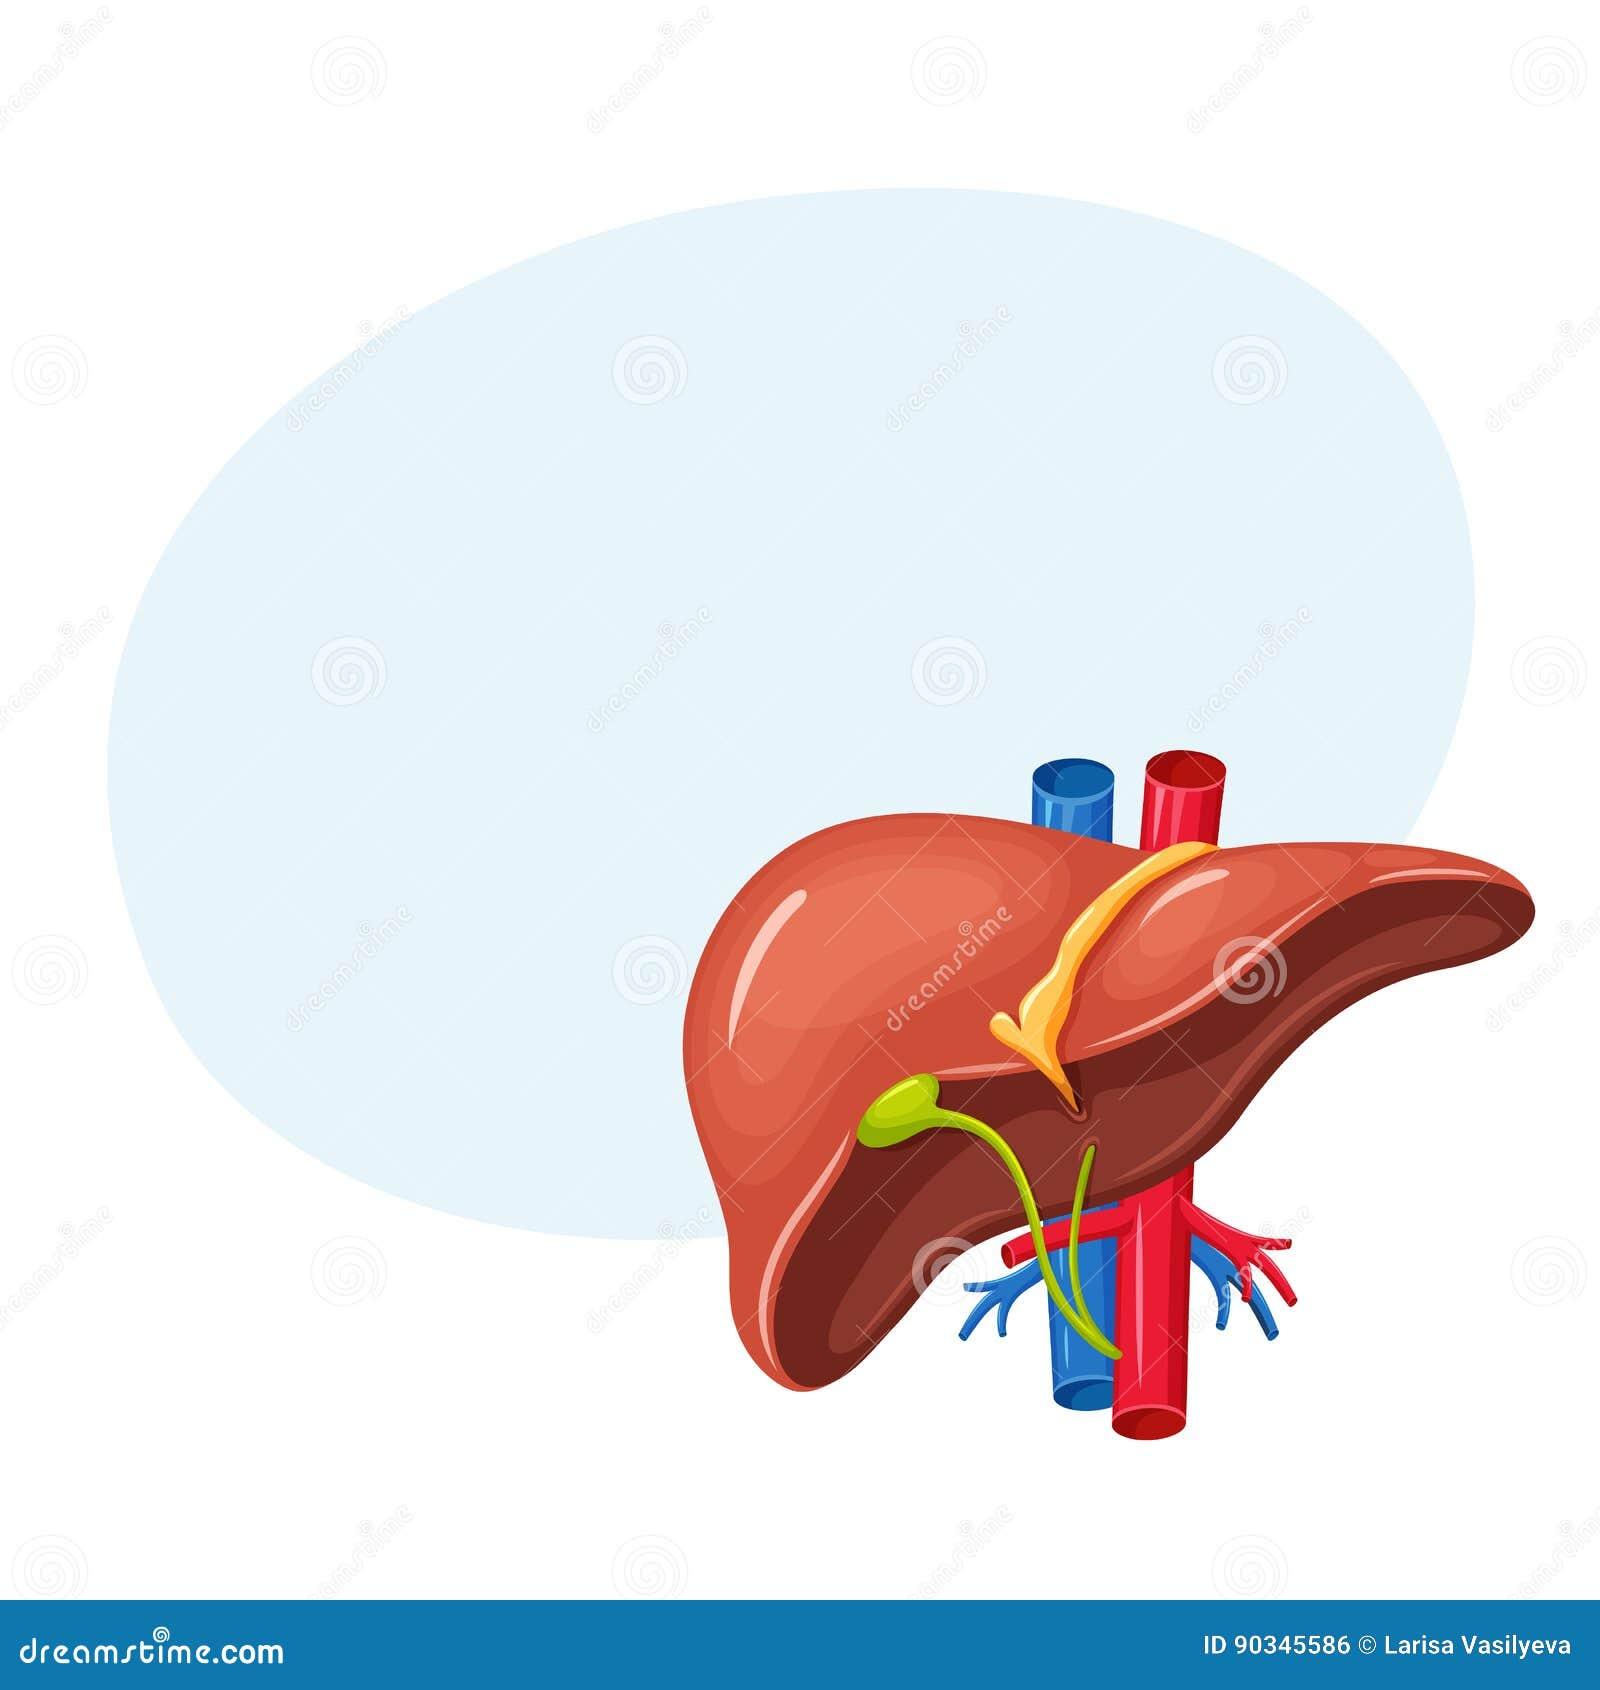 Human Liver Anatomy Stock Vector Illustration Of Gall 90345586